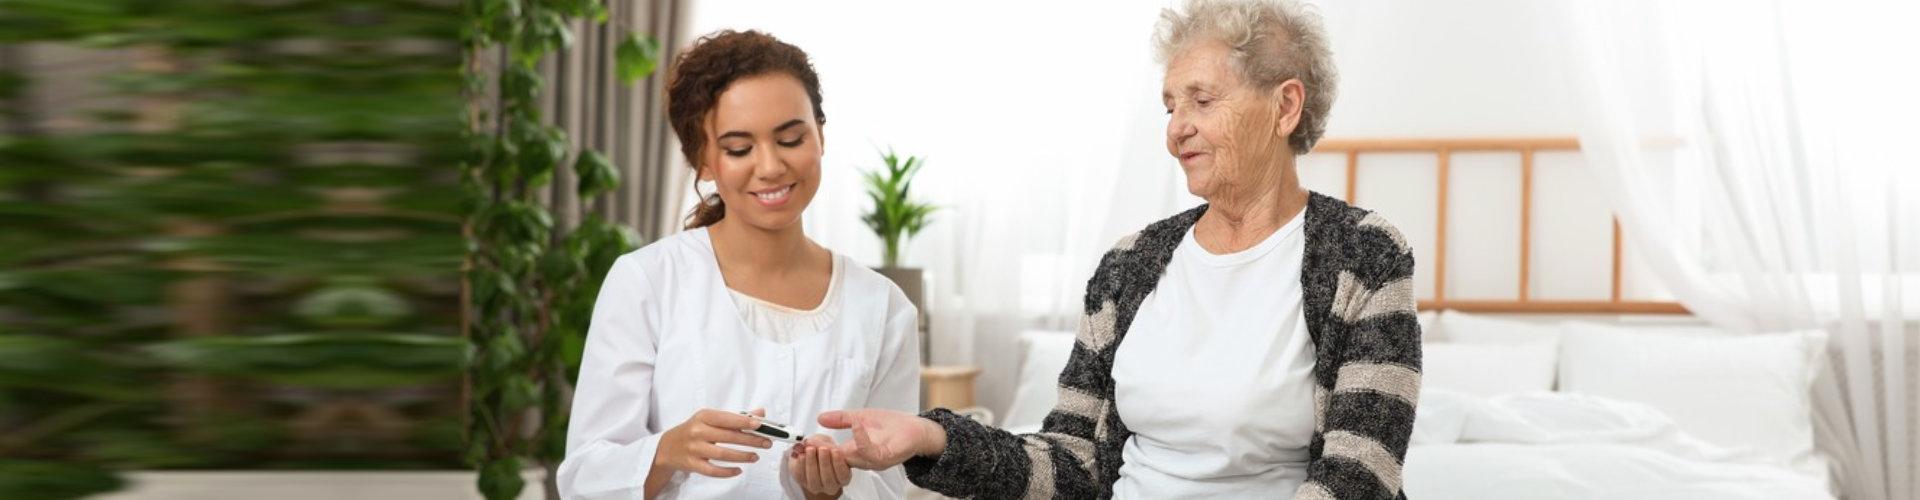 caregiver checking senior woman's blood pressure